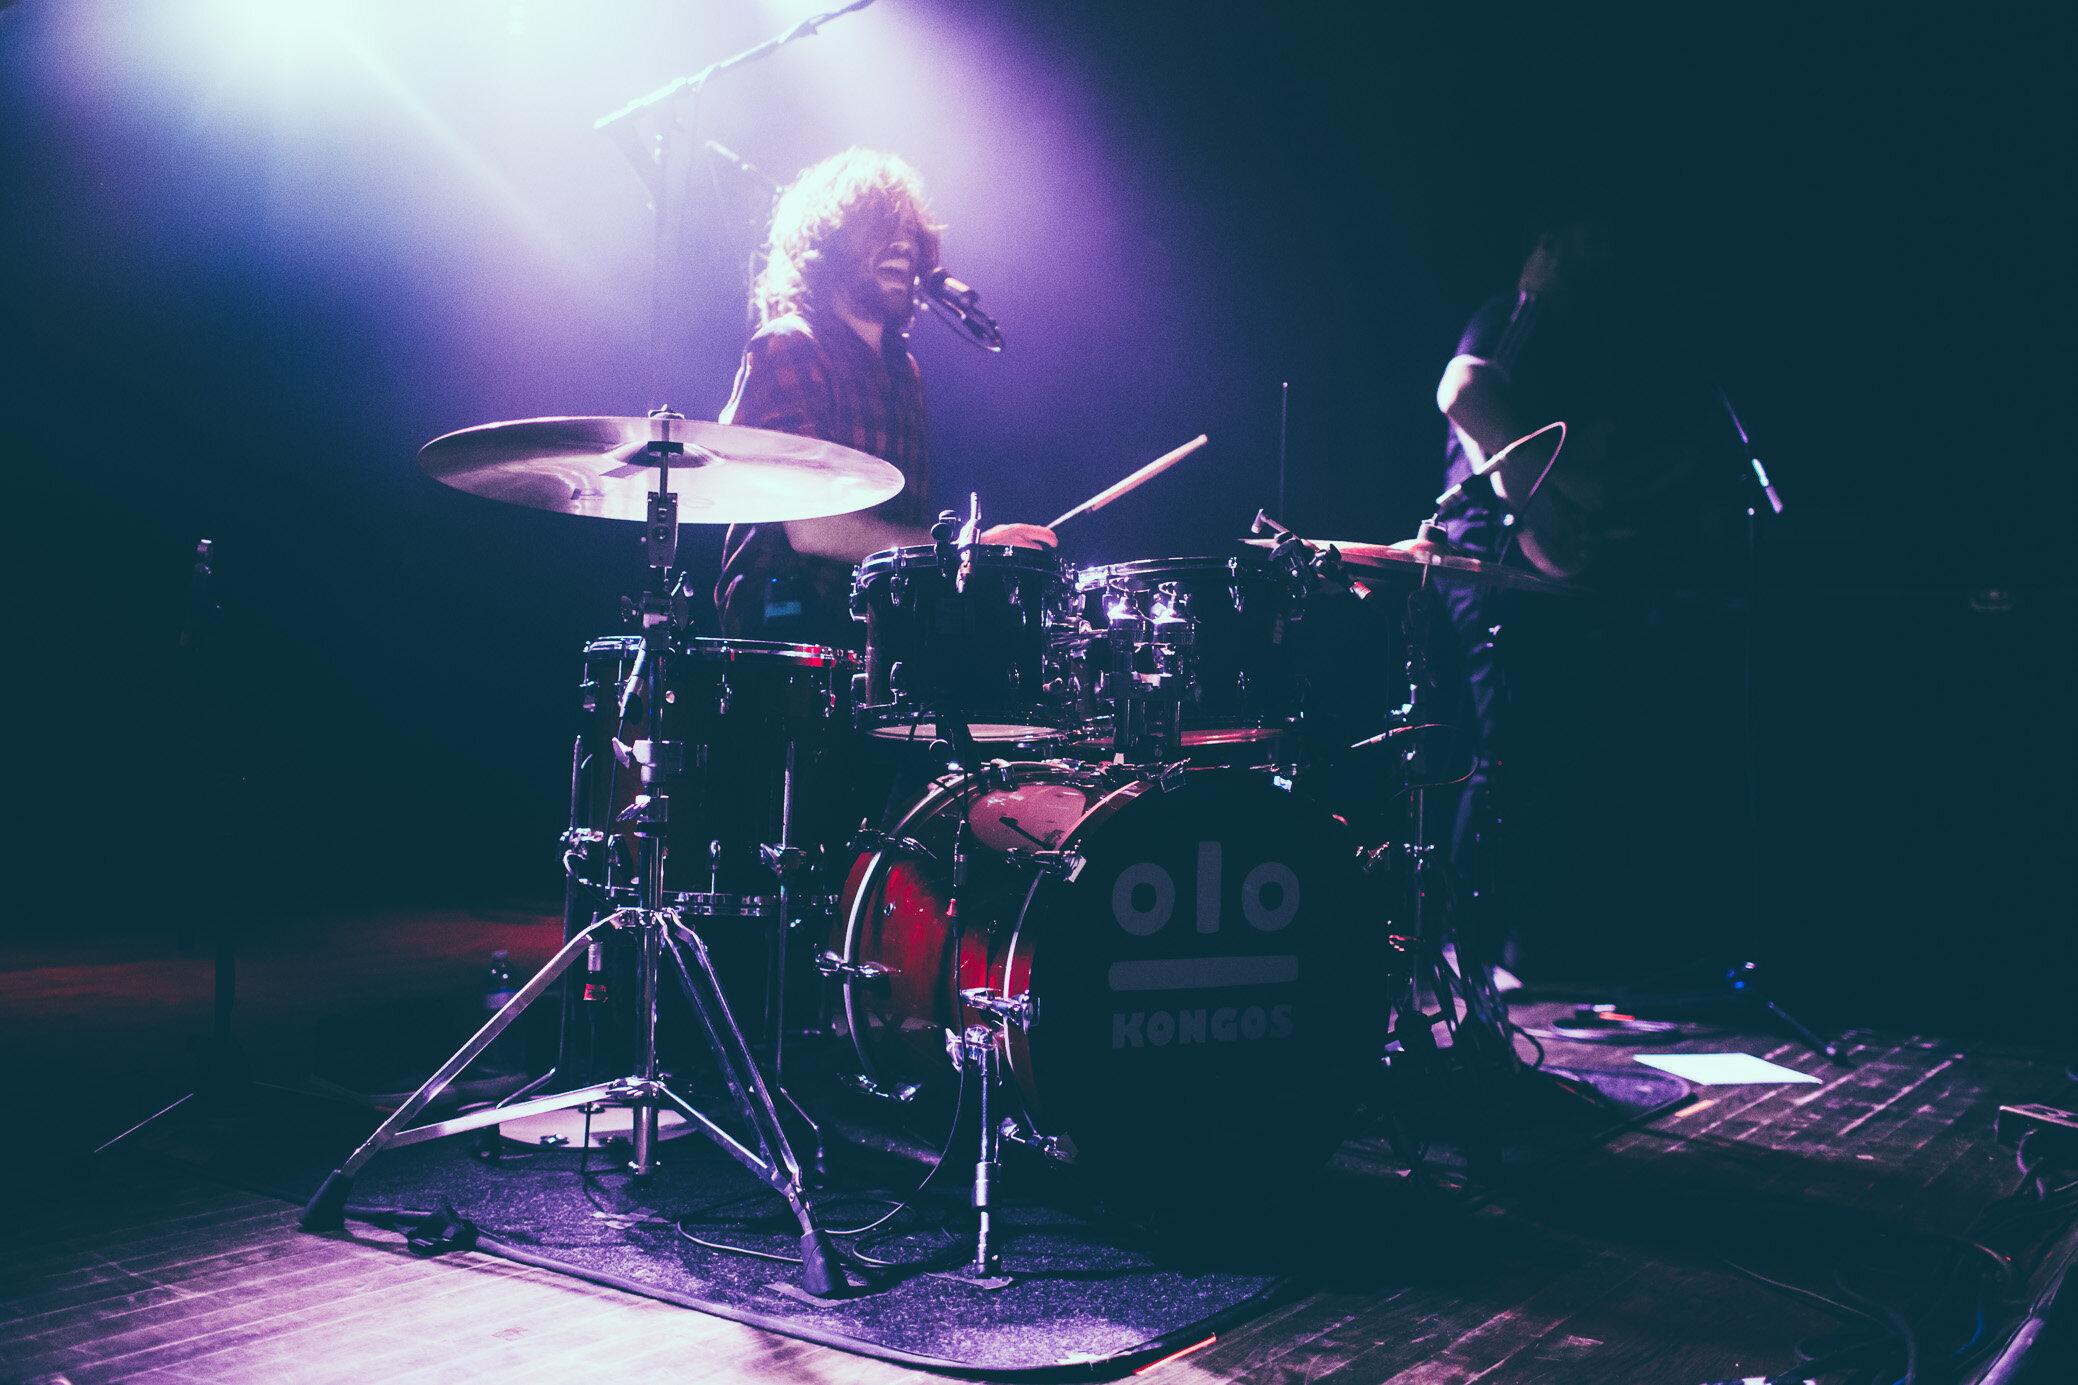 KONGOS perform in concert at Saturn Birmingham in Birmingham, Alabama on October 8th, 2019. (Photo by David A. Smith / DSmithScenes)